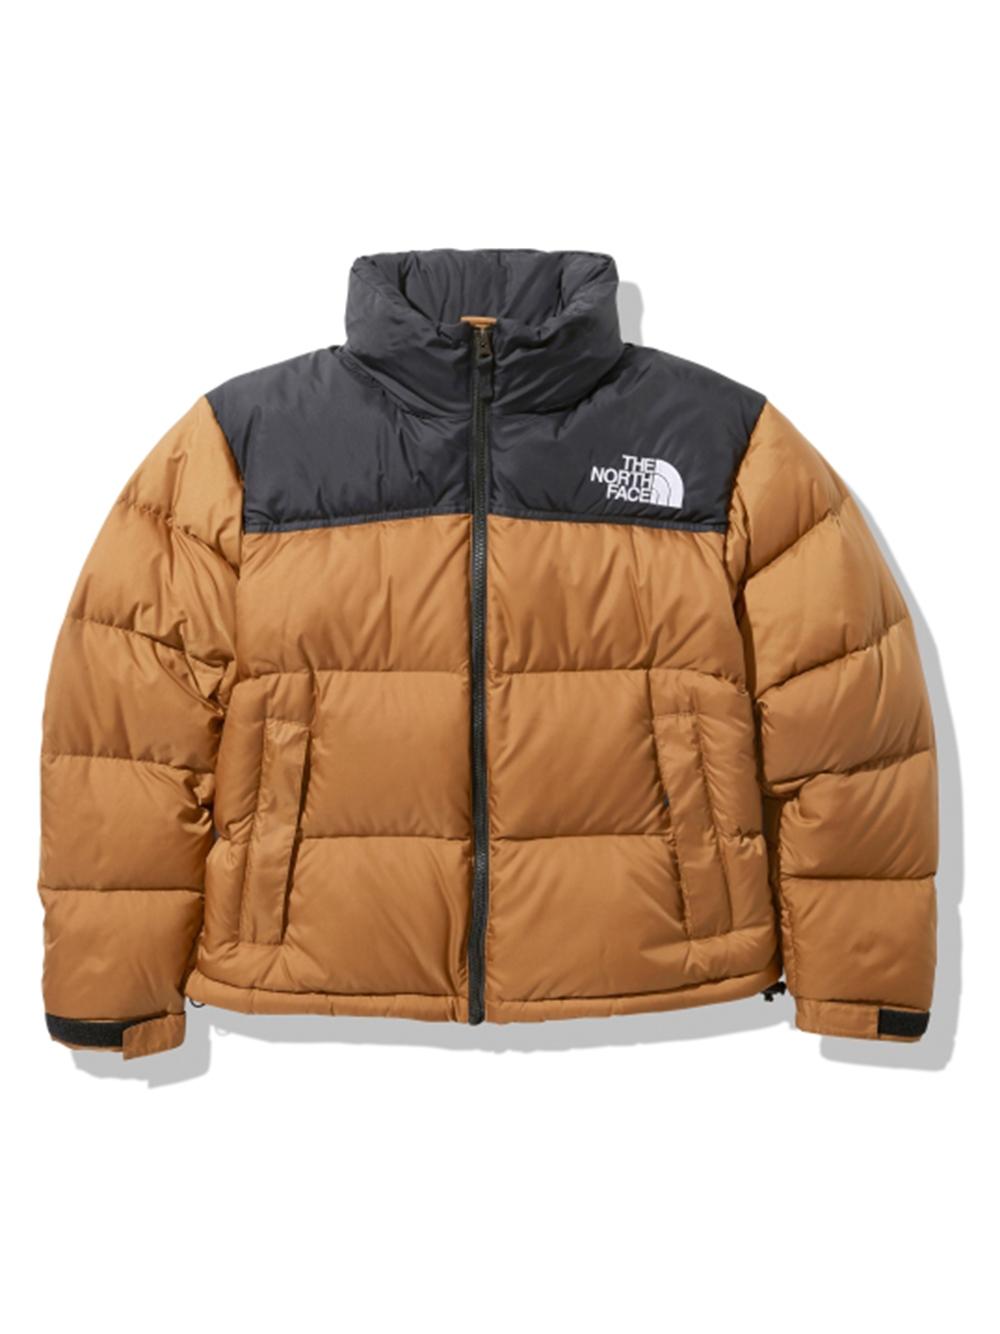 【THE NORTH FACE】Short Nuptse Jacket(BRW-M)